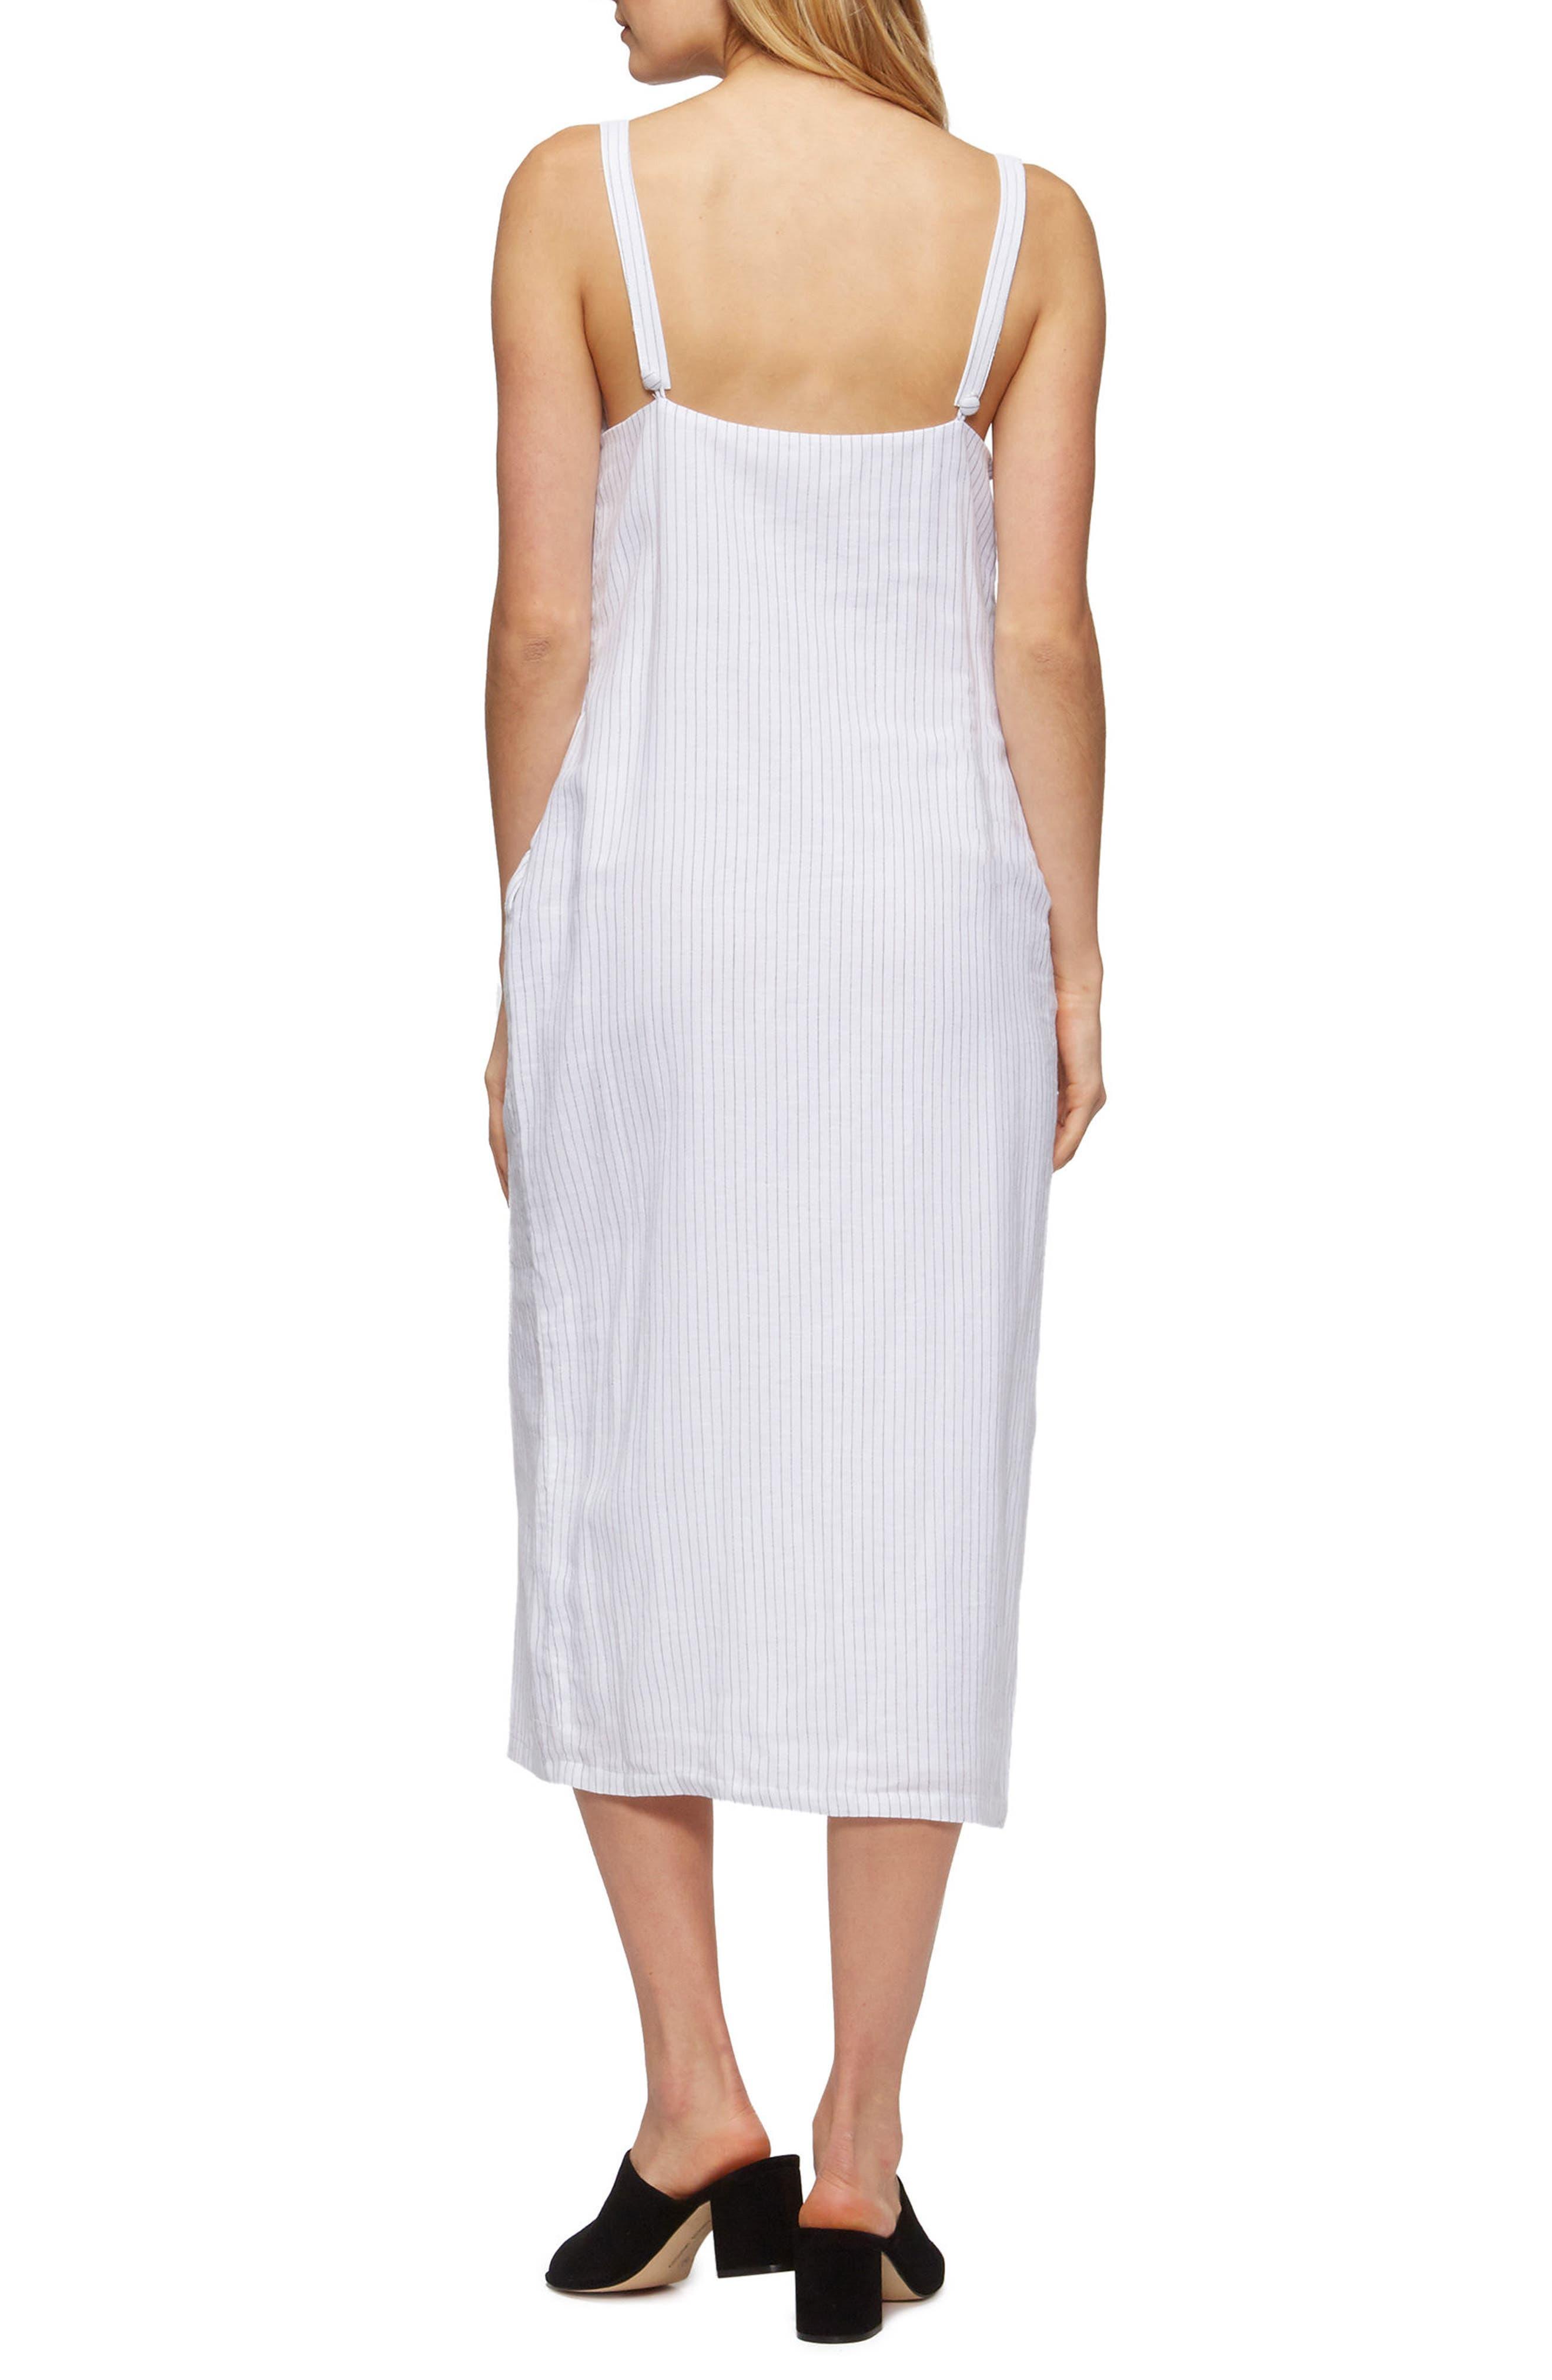 Tara Cover-Up Dress,                             Alternate thumbnail 2, color,                             100